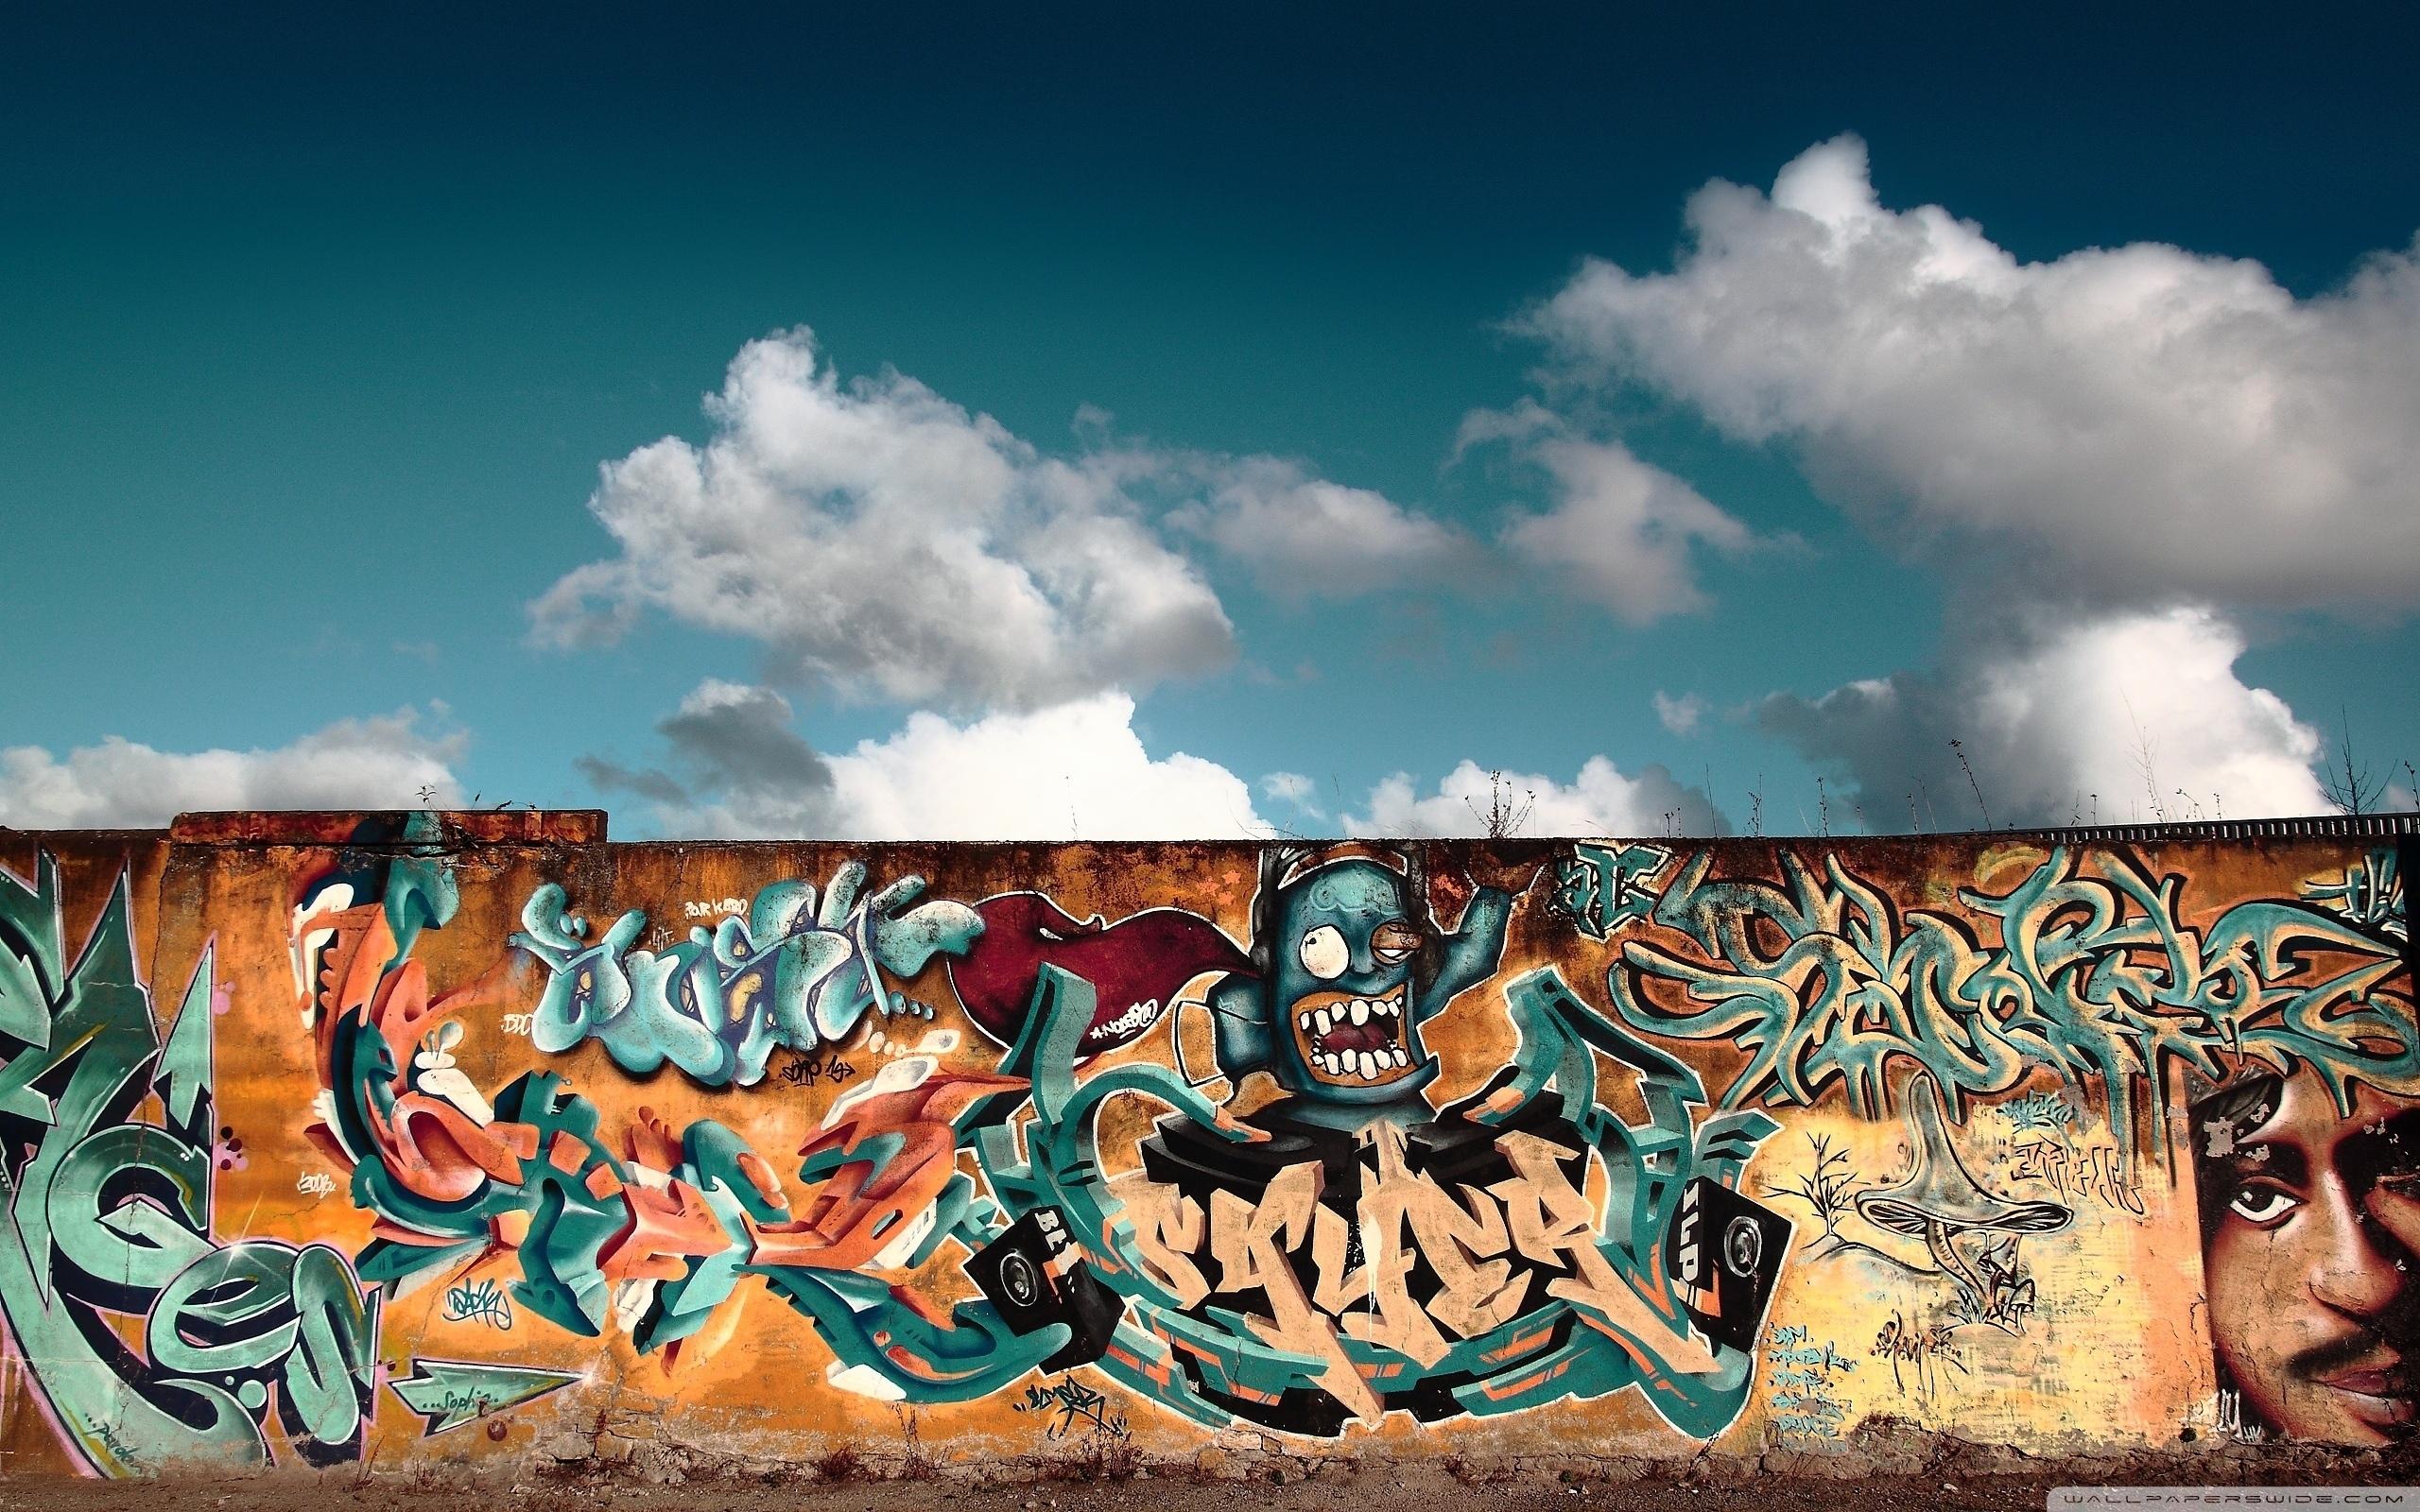 Graffiti Wall Art ❤ 4K Hd Desktop Wallpaper For 4K Ultra Hd Tv Inside Graffiti Wall Art (View 7 of 20)